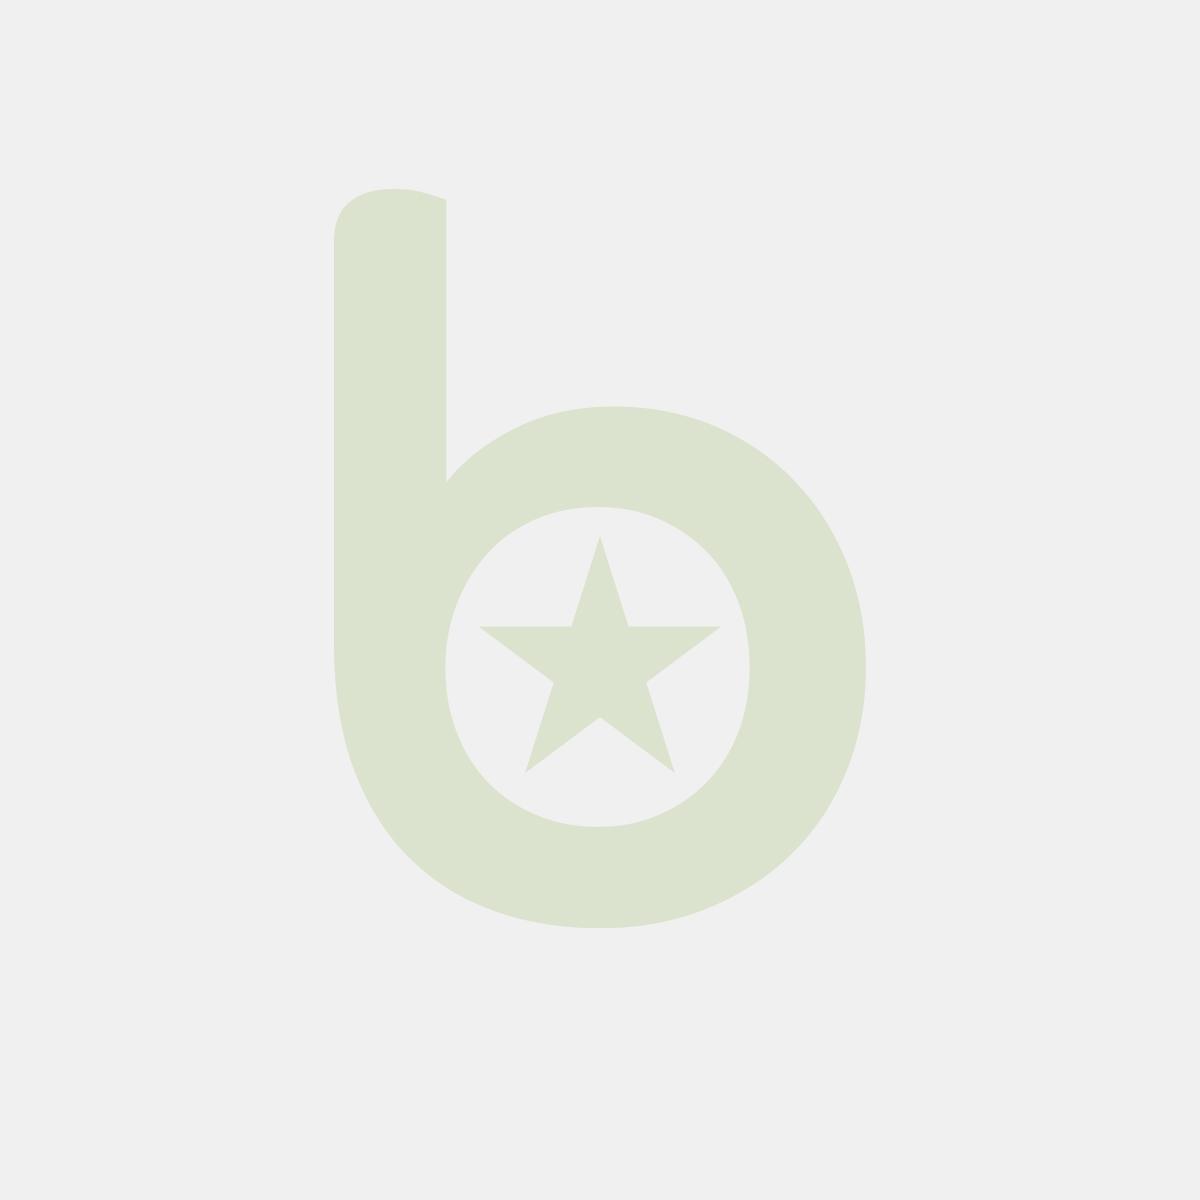 Etui na sztućce bordowe 23,5x7,3cm z kolorową serwetką op. 100 sztuk